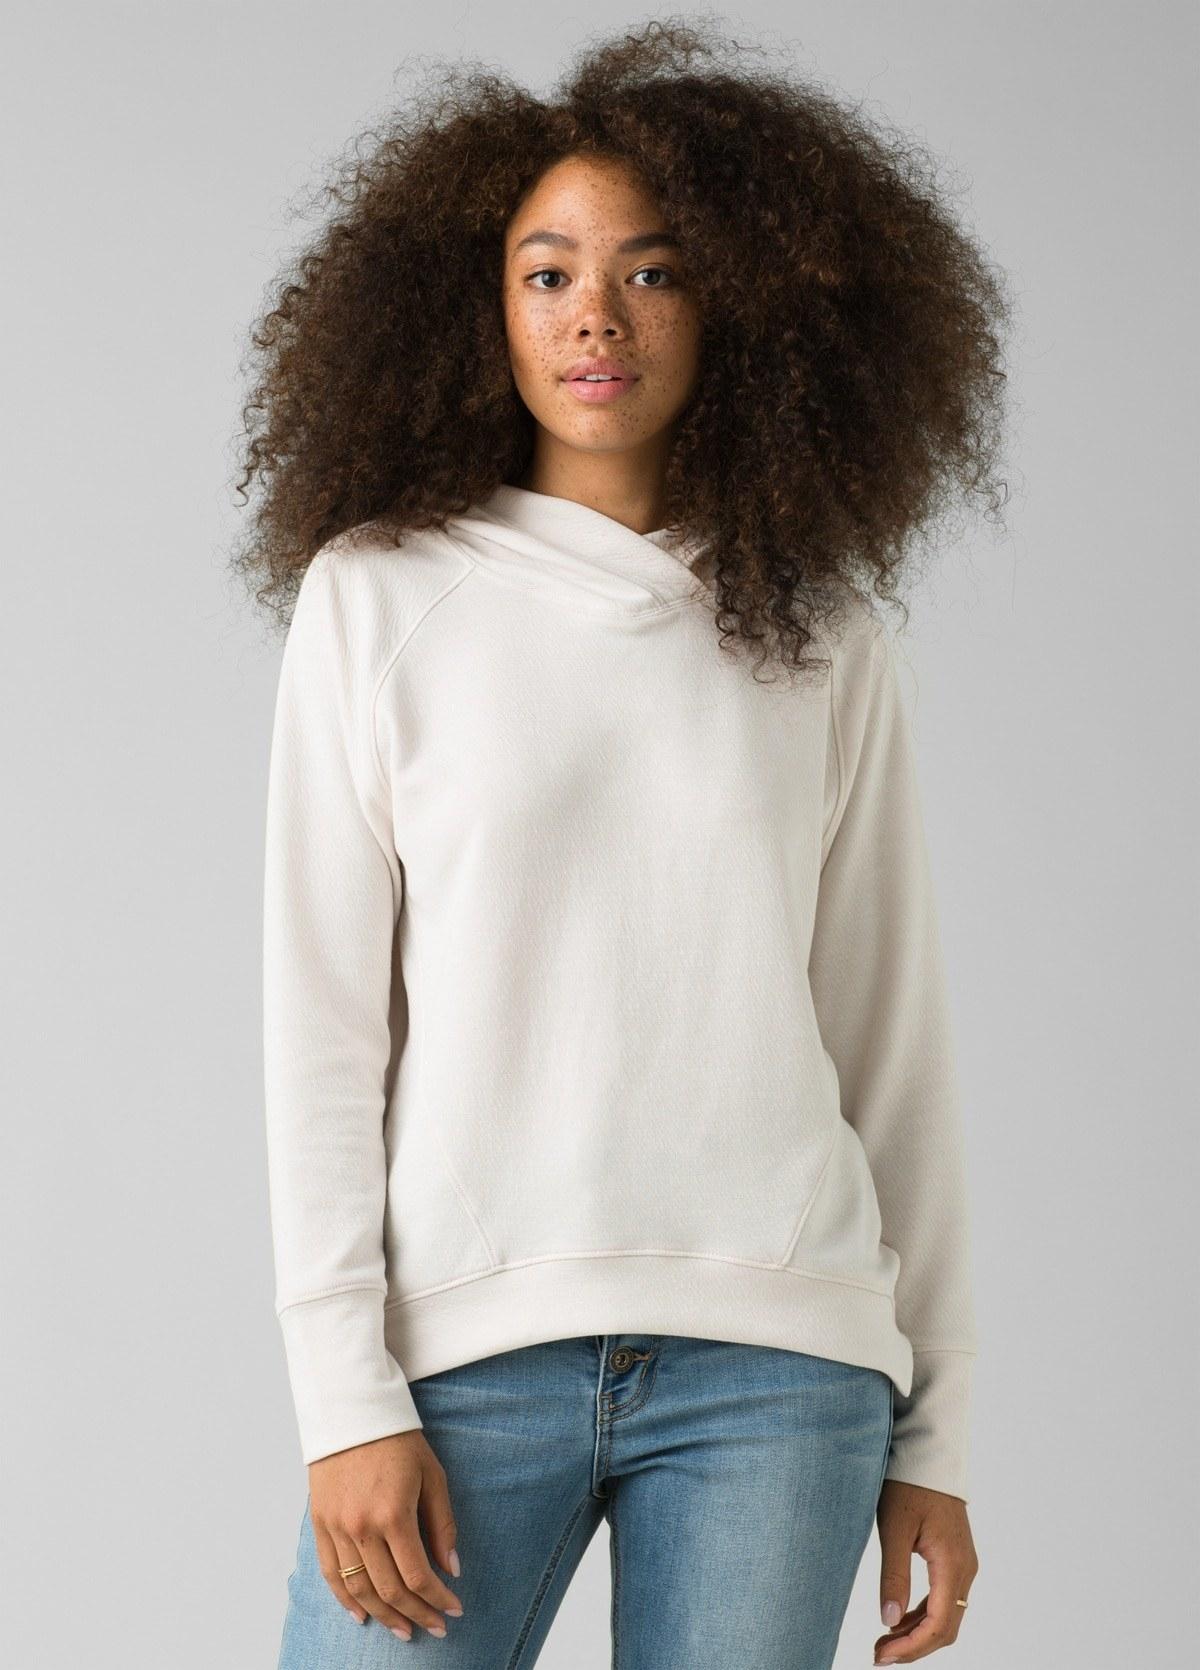 model in white hoodie with a slightly upward curving hemline